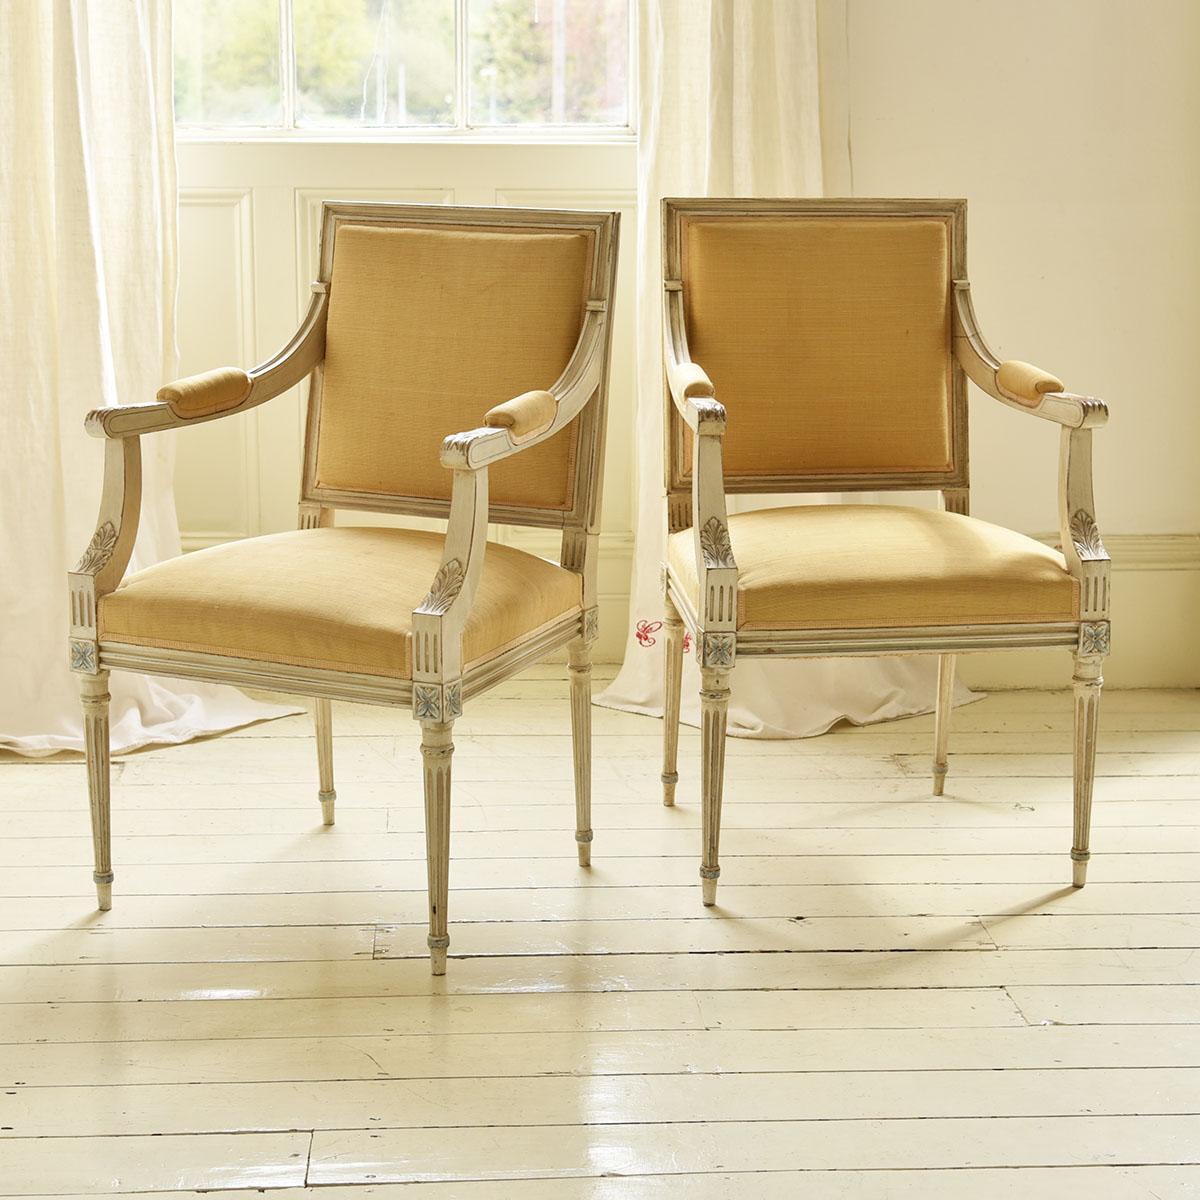 Pair of Gustavian chairs